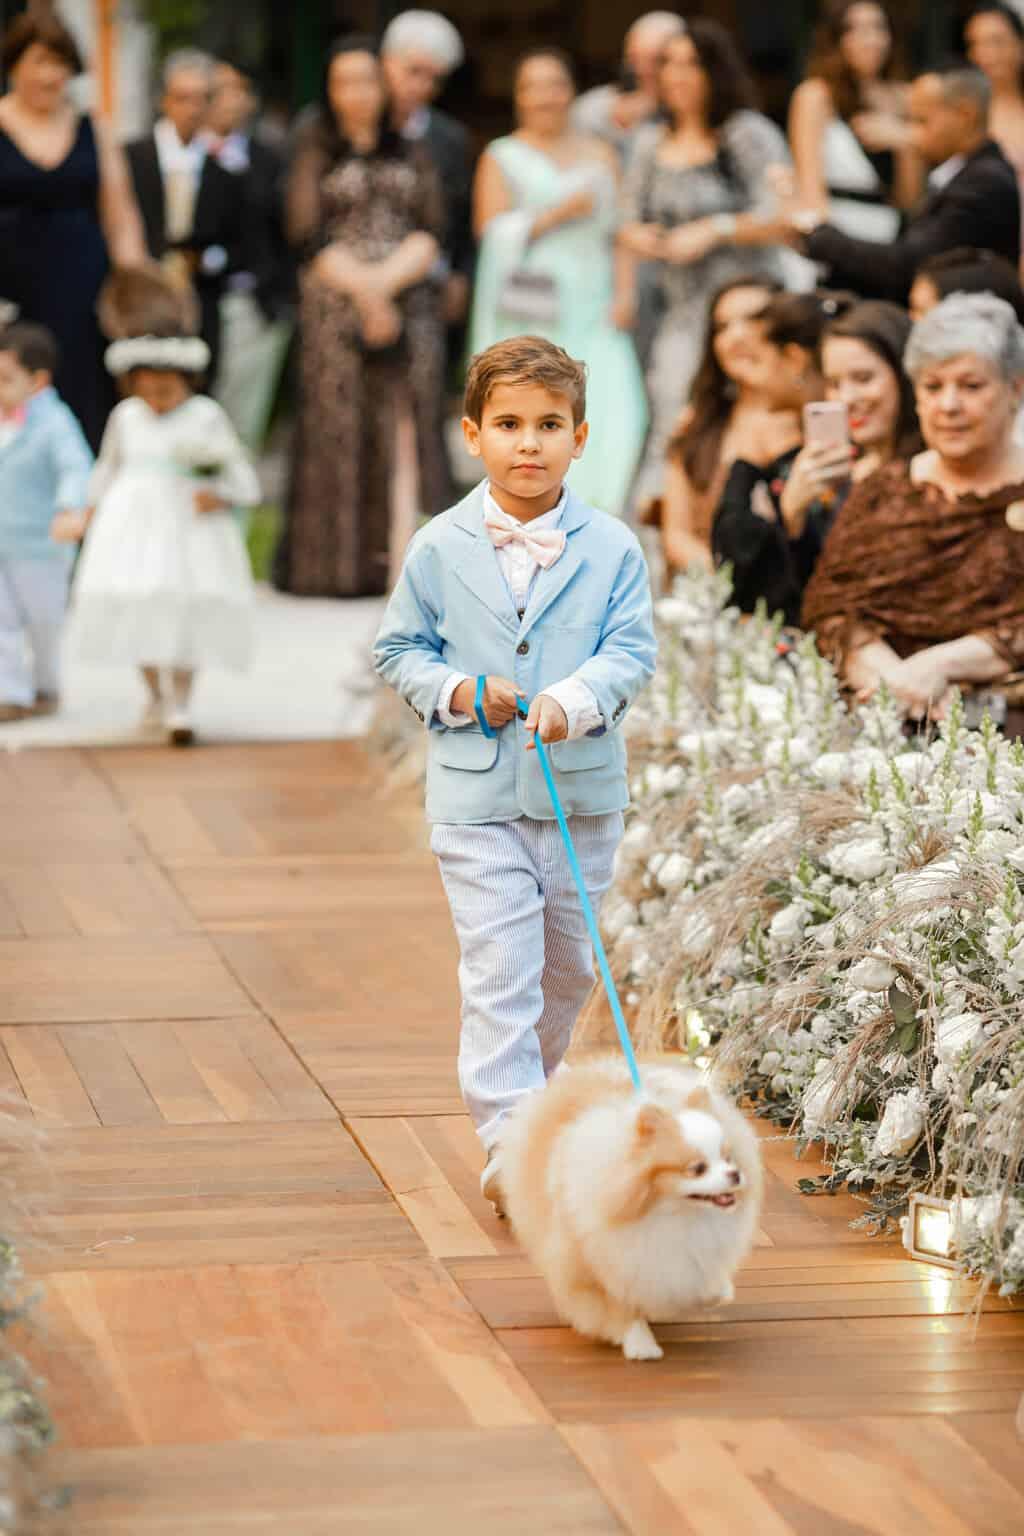 casamento-Beatriz-e-Joao-Fernando-daminhas-e-pajens-Itaipava-Locanda-Della-Mimosa-pet-no-casamento-Thienny-Tammis123